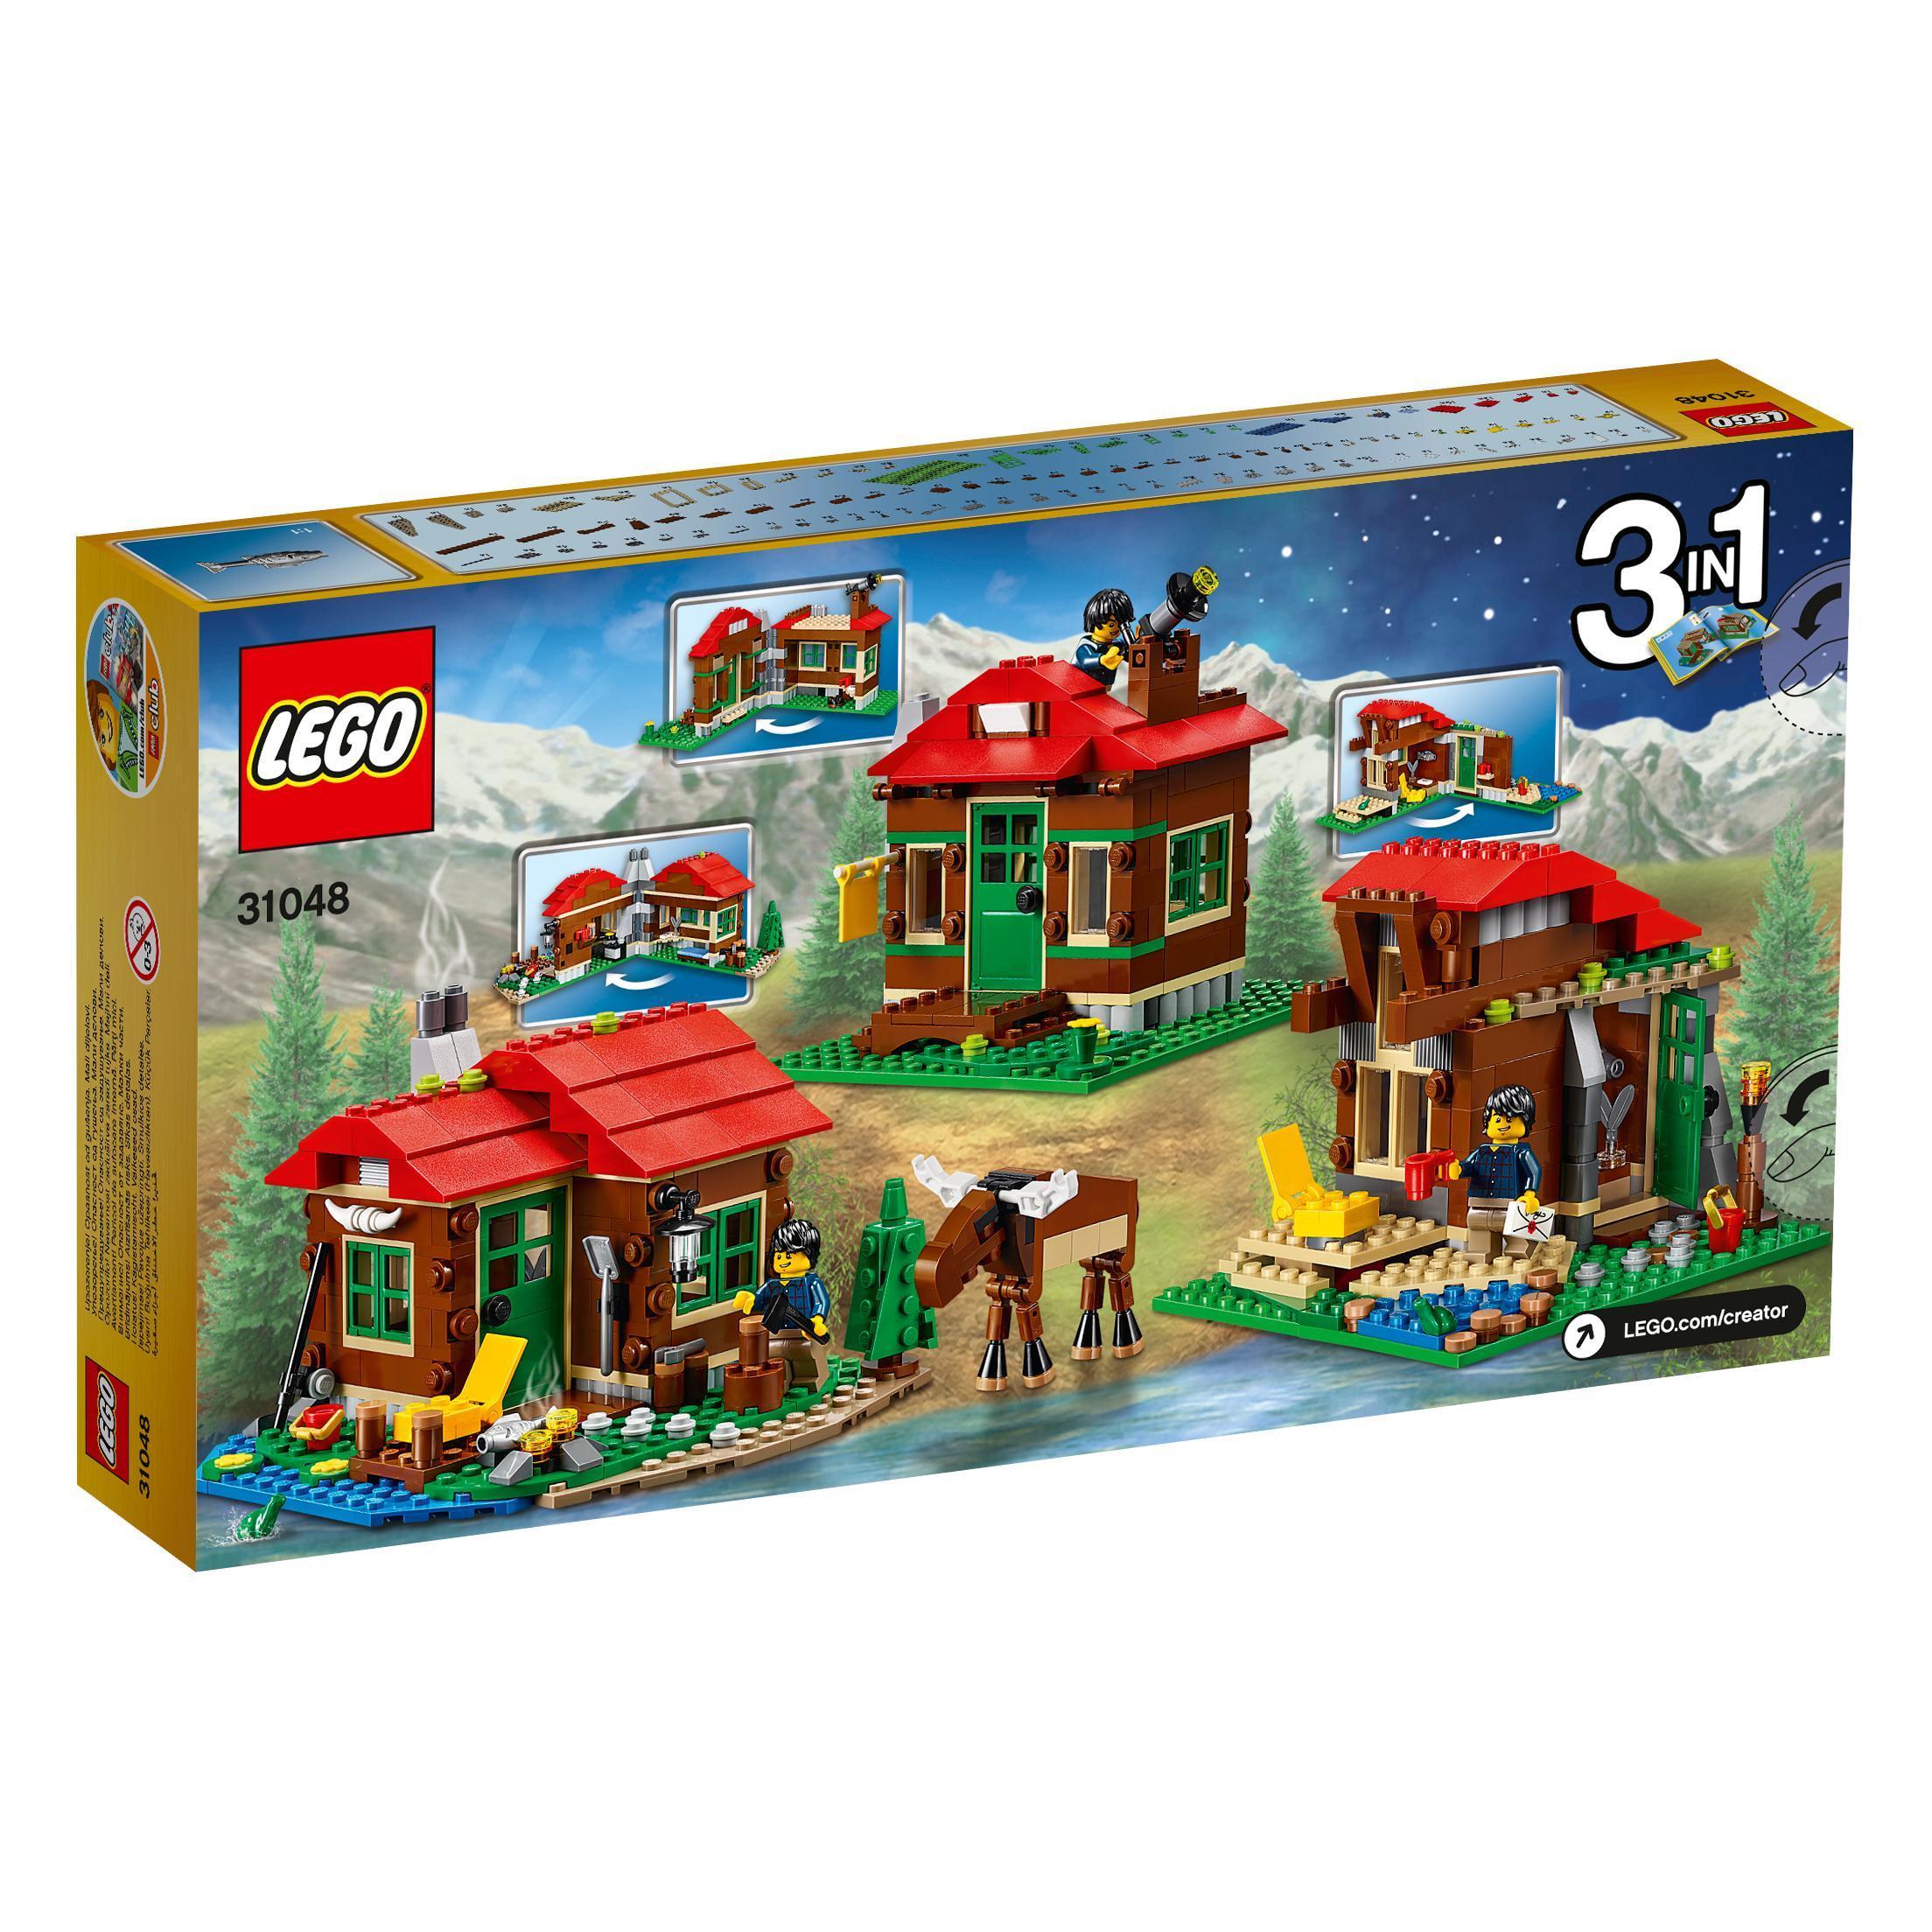 lego creator 31048 lakeside lodge set lego. Black Bedroom Furniture Sets. Home Design Ideas